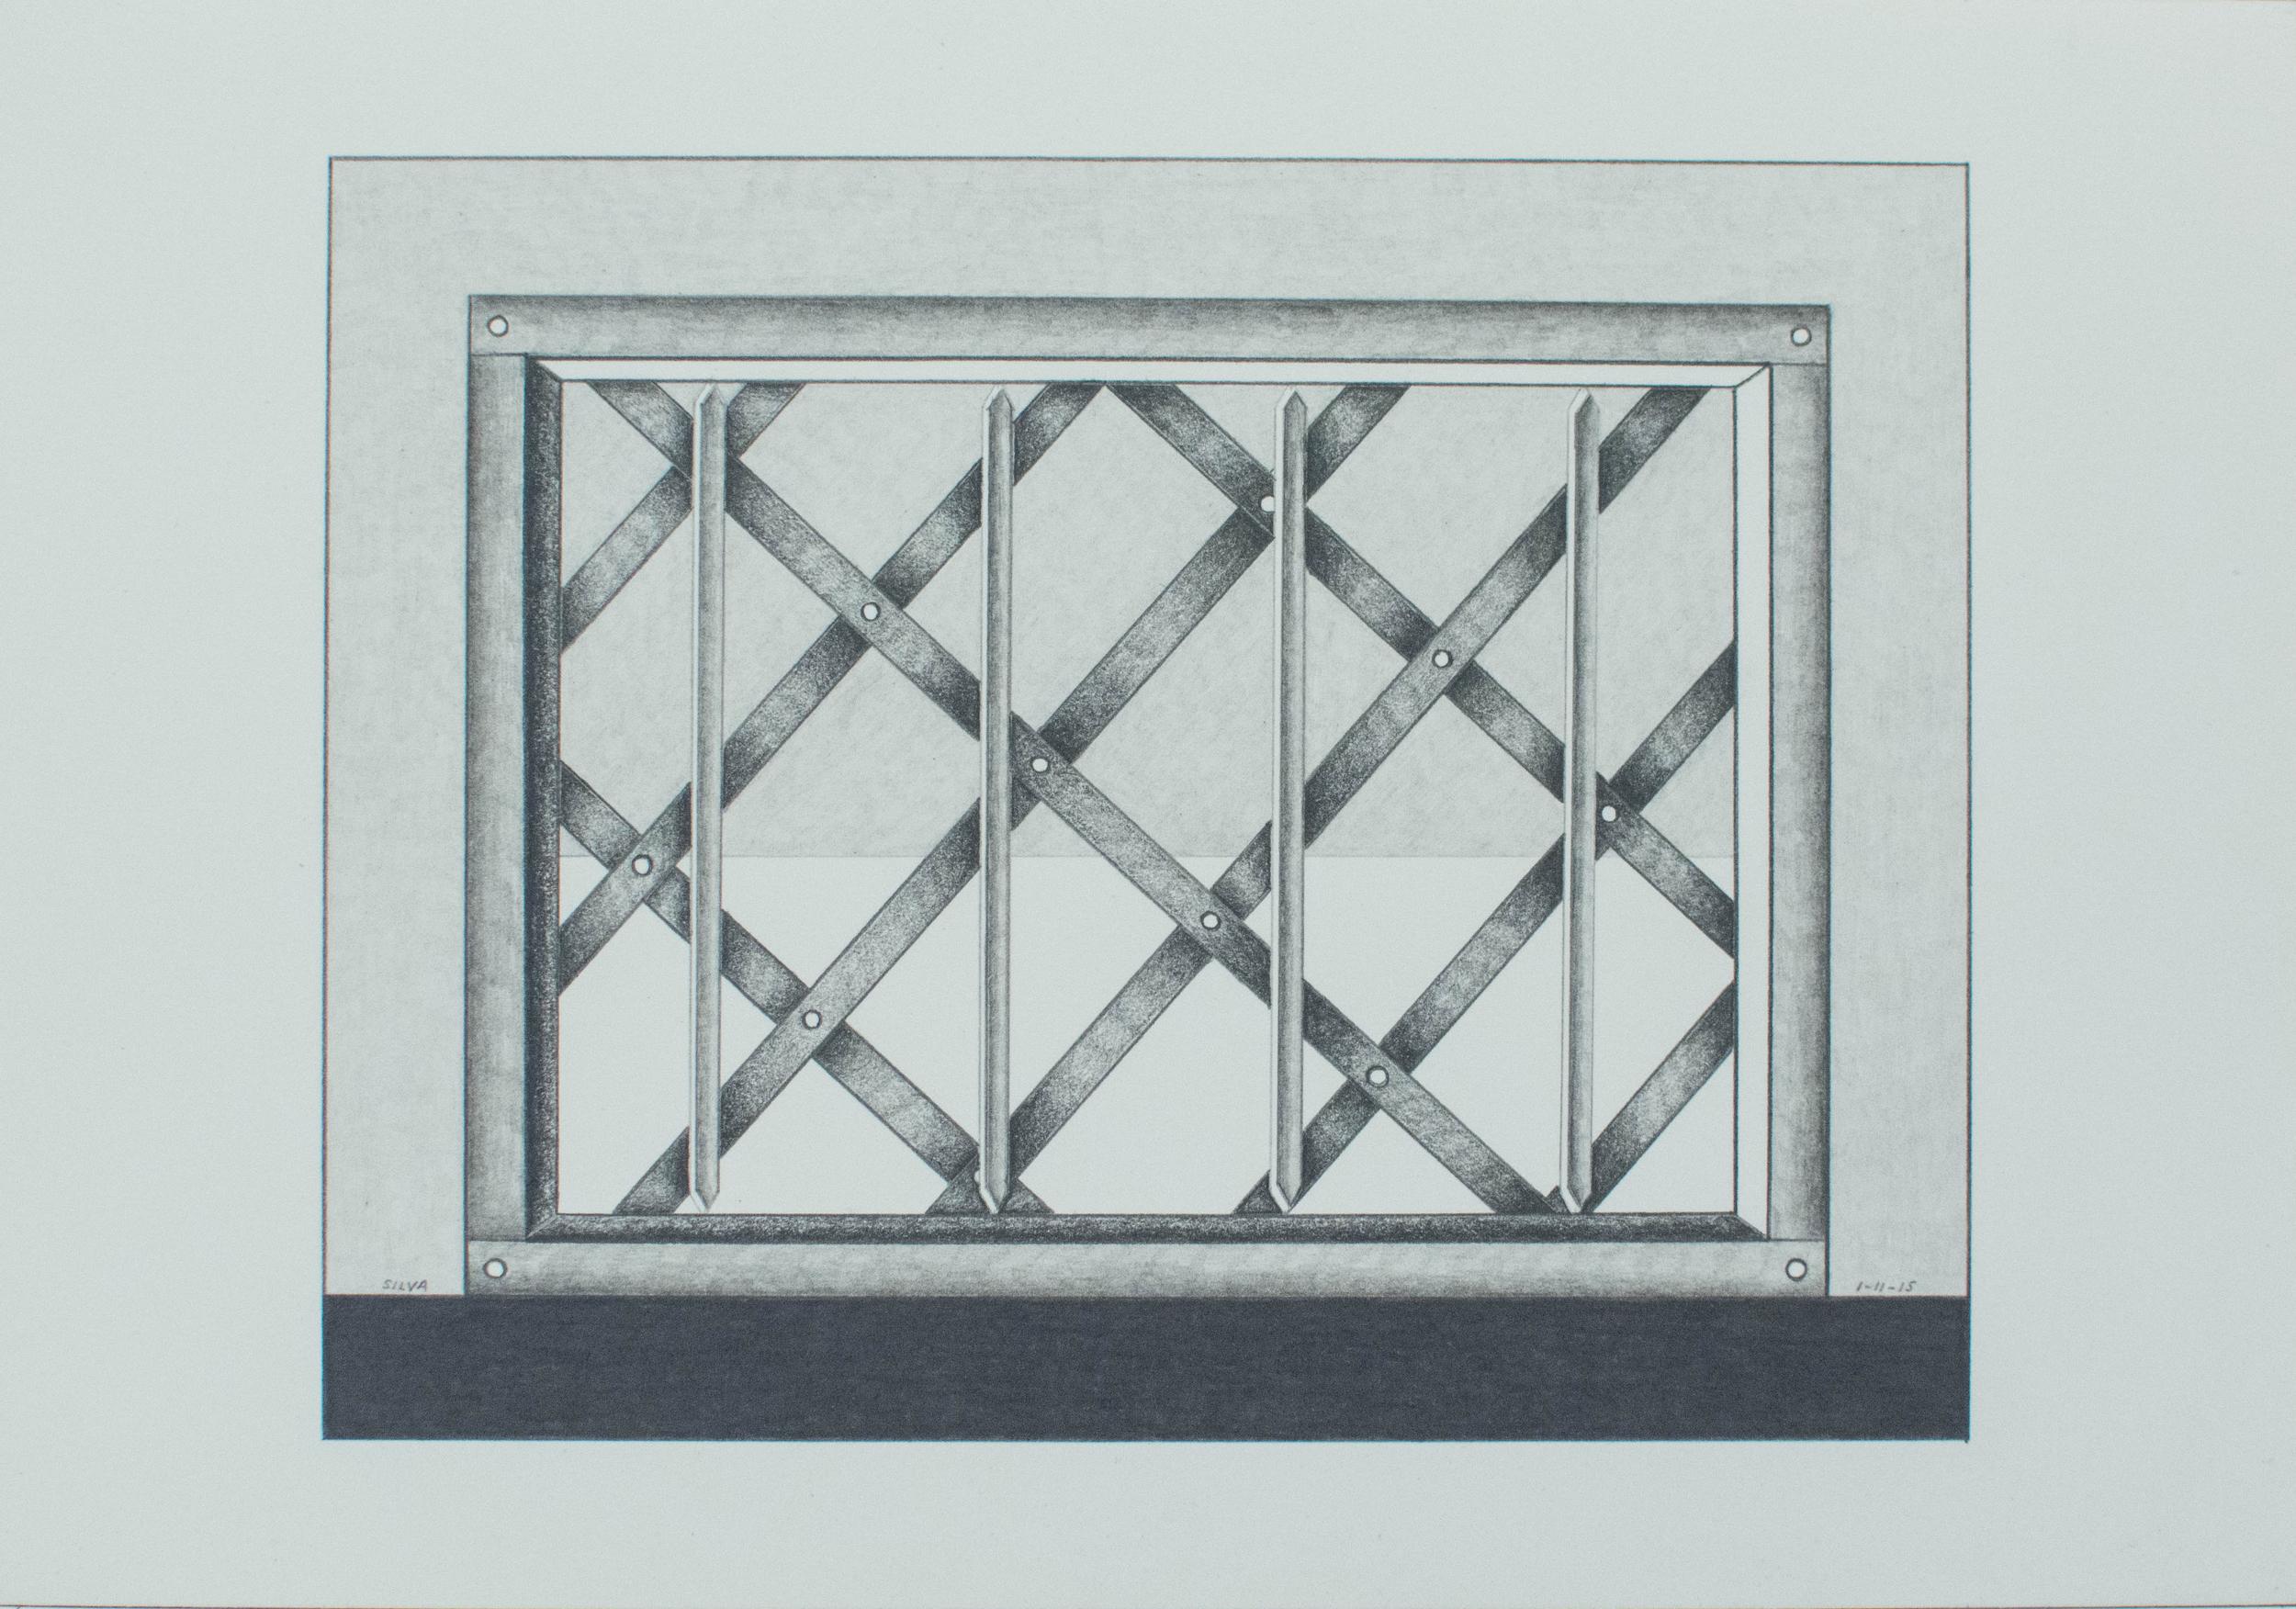 1-11-15, 2015, Graphite on paper, 7 x 10 inches